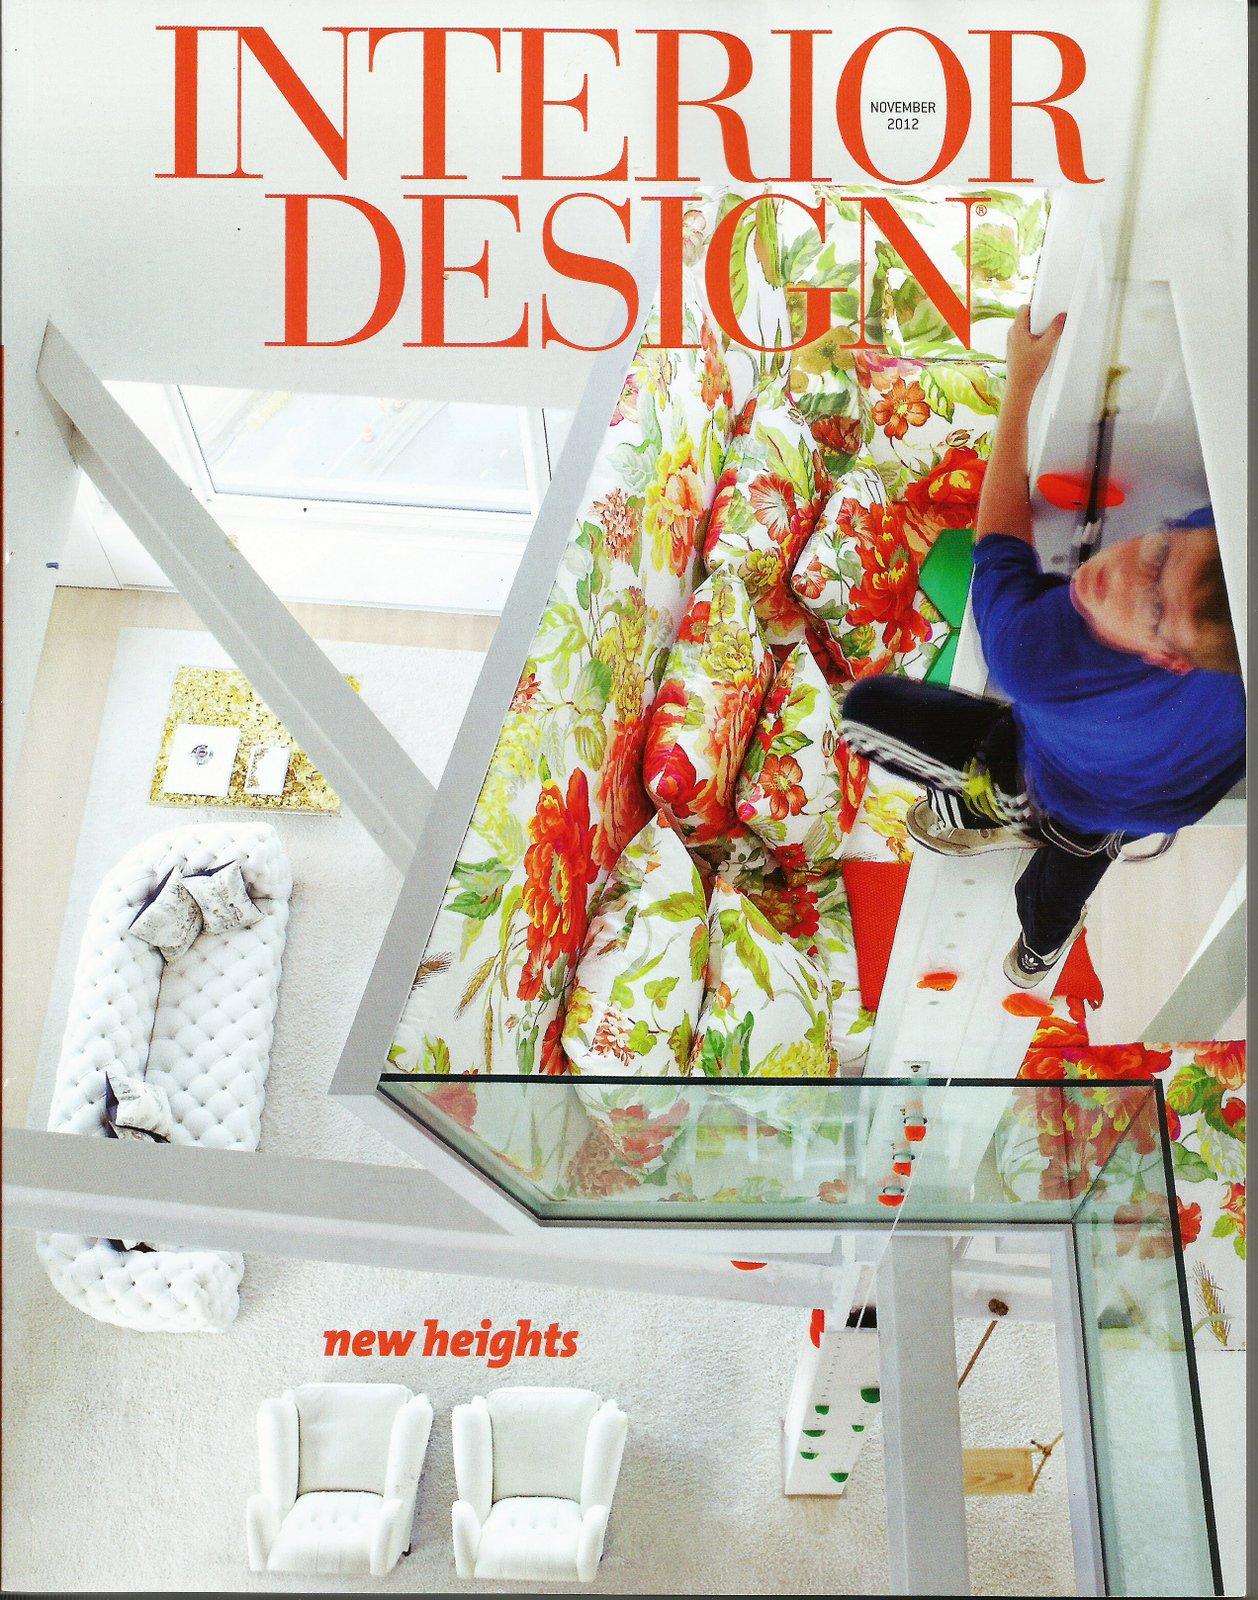 2012_nov_interiordesign_1.jpg